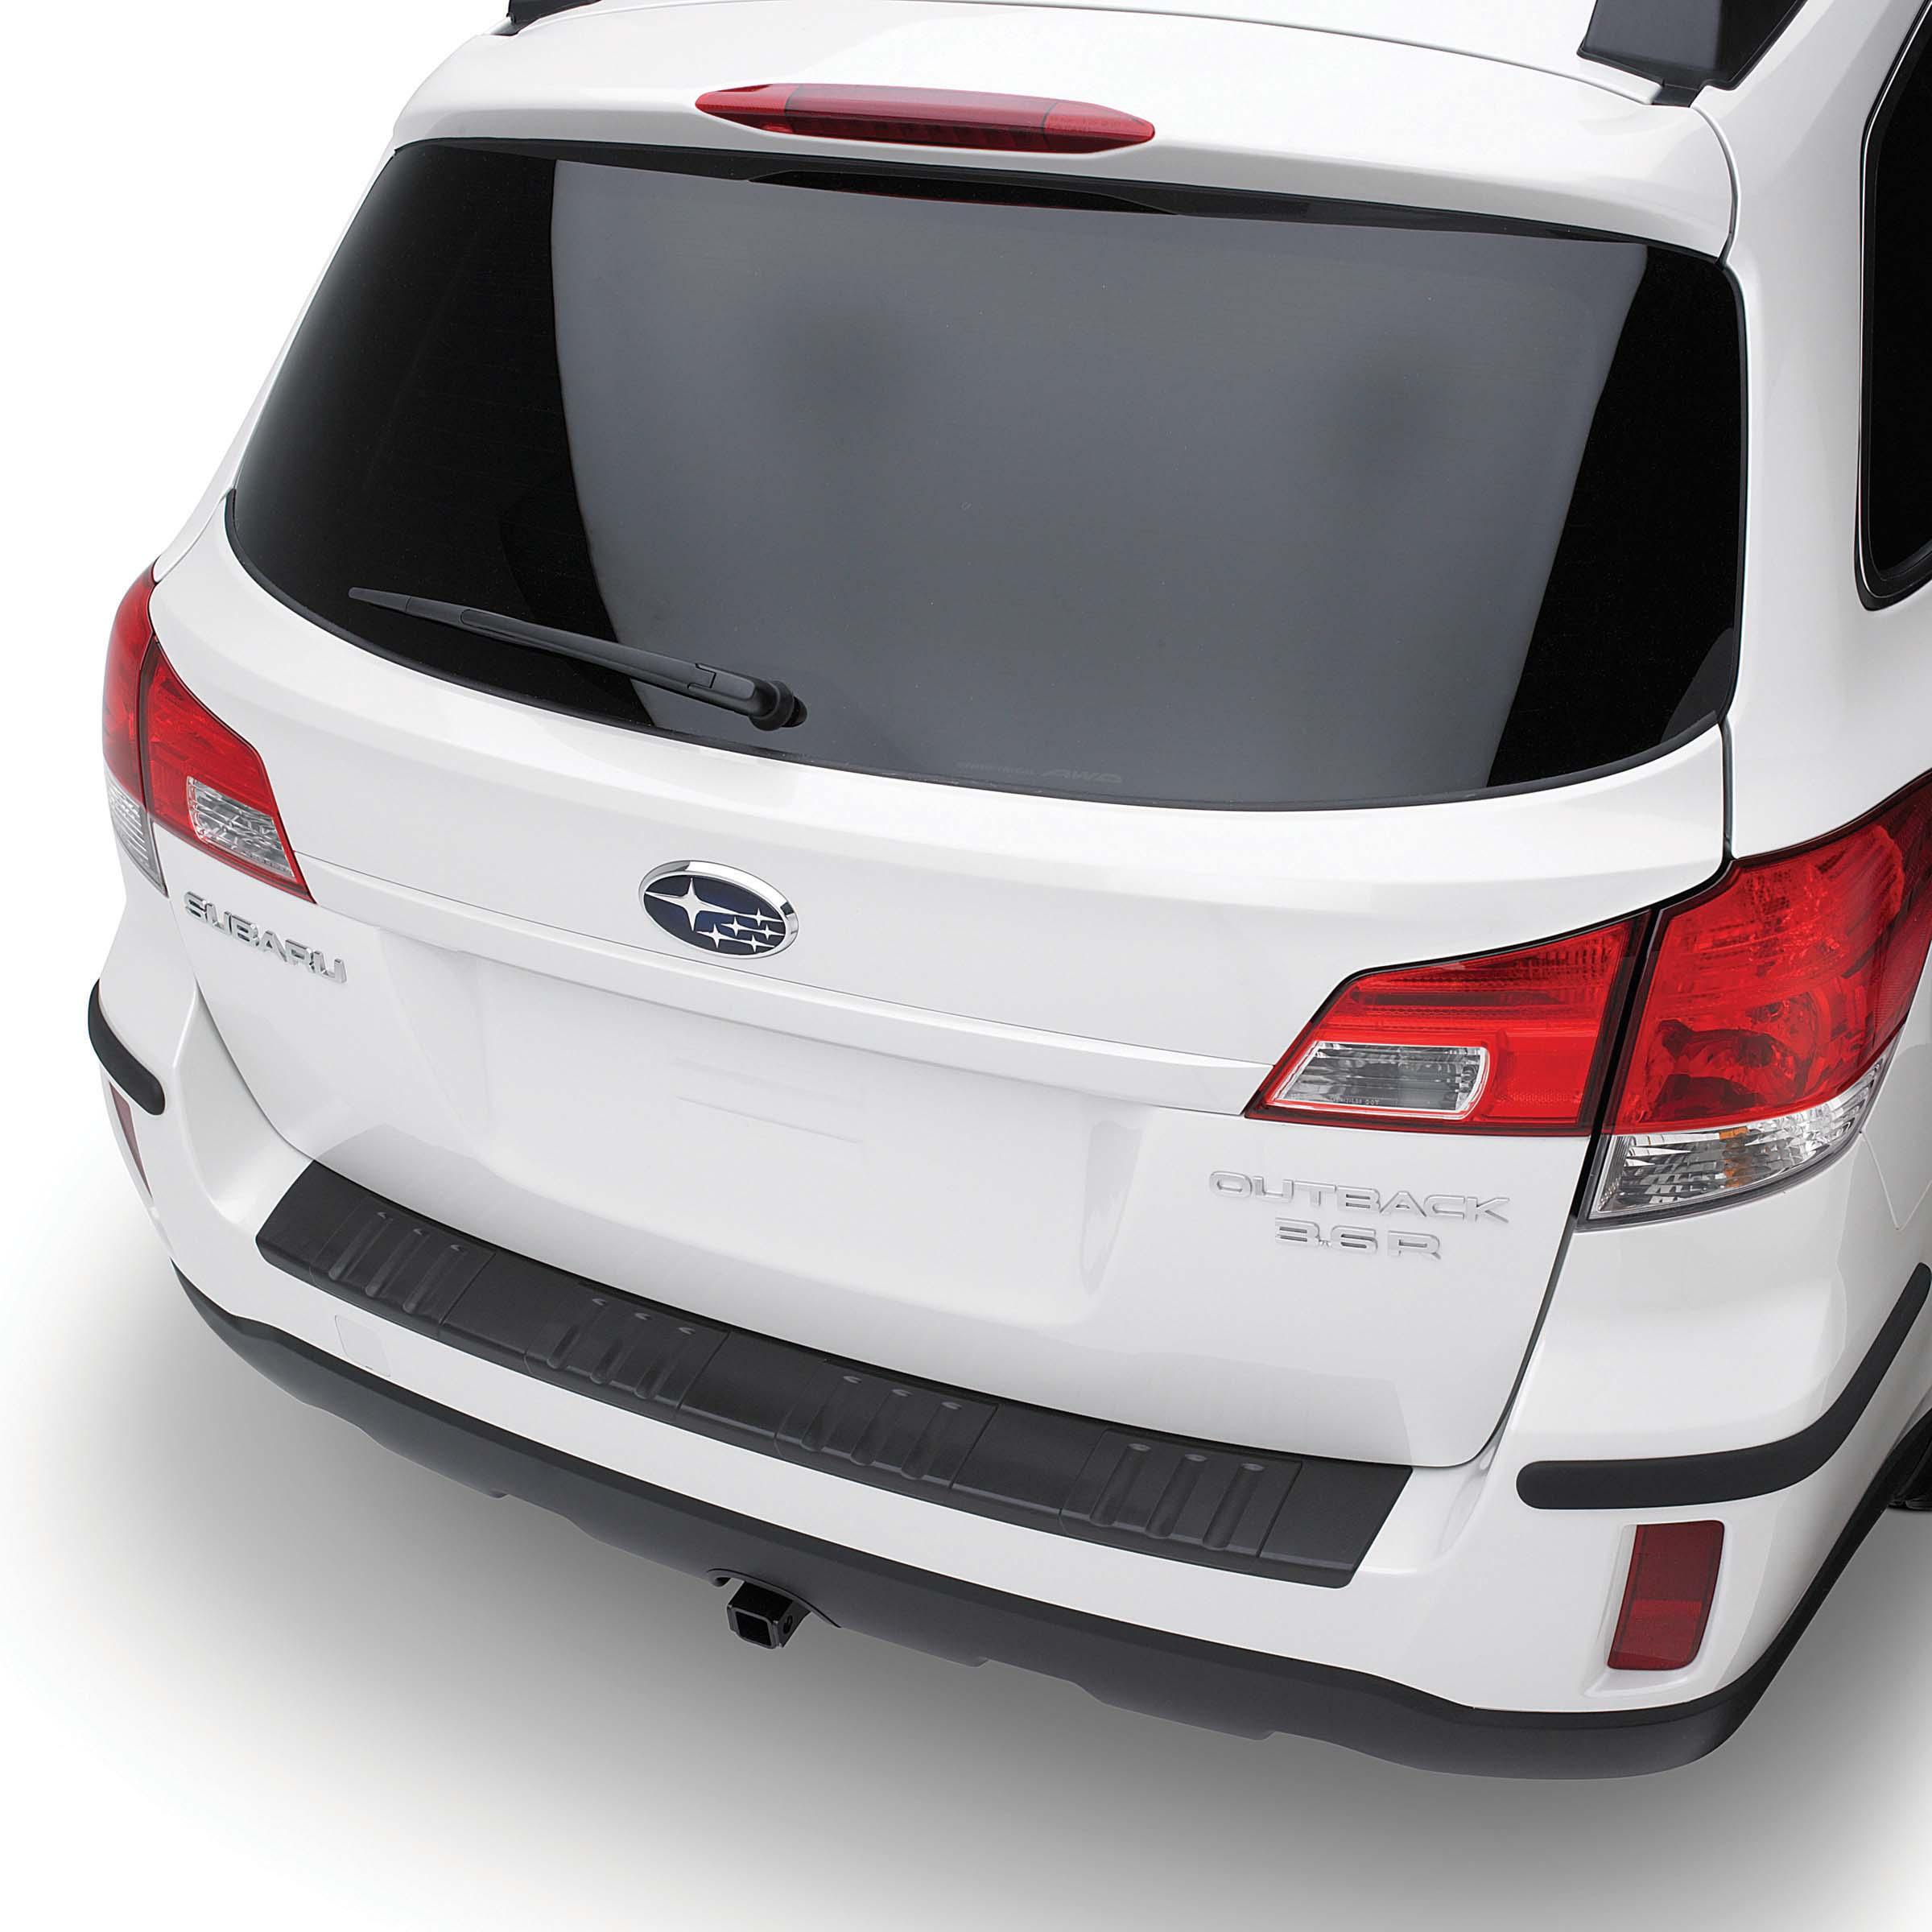 2010 Subaru Outback Rear Seat Cover